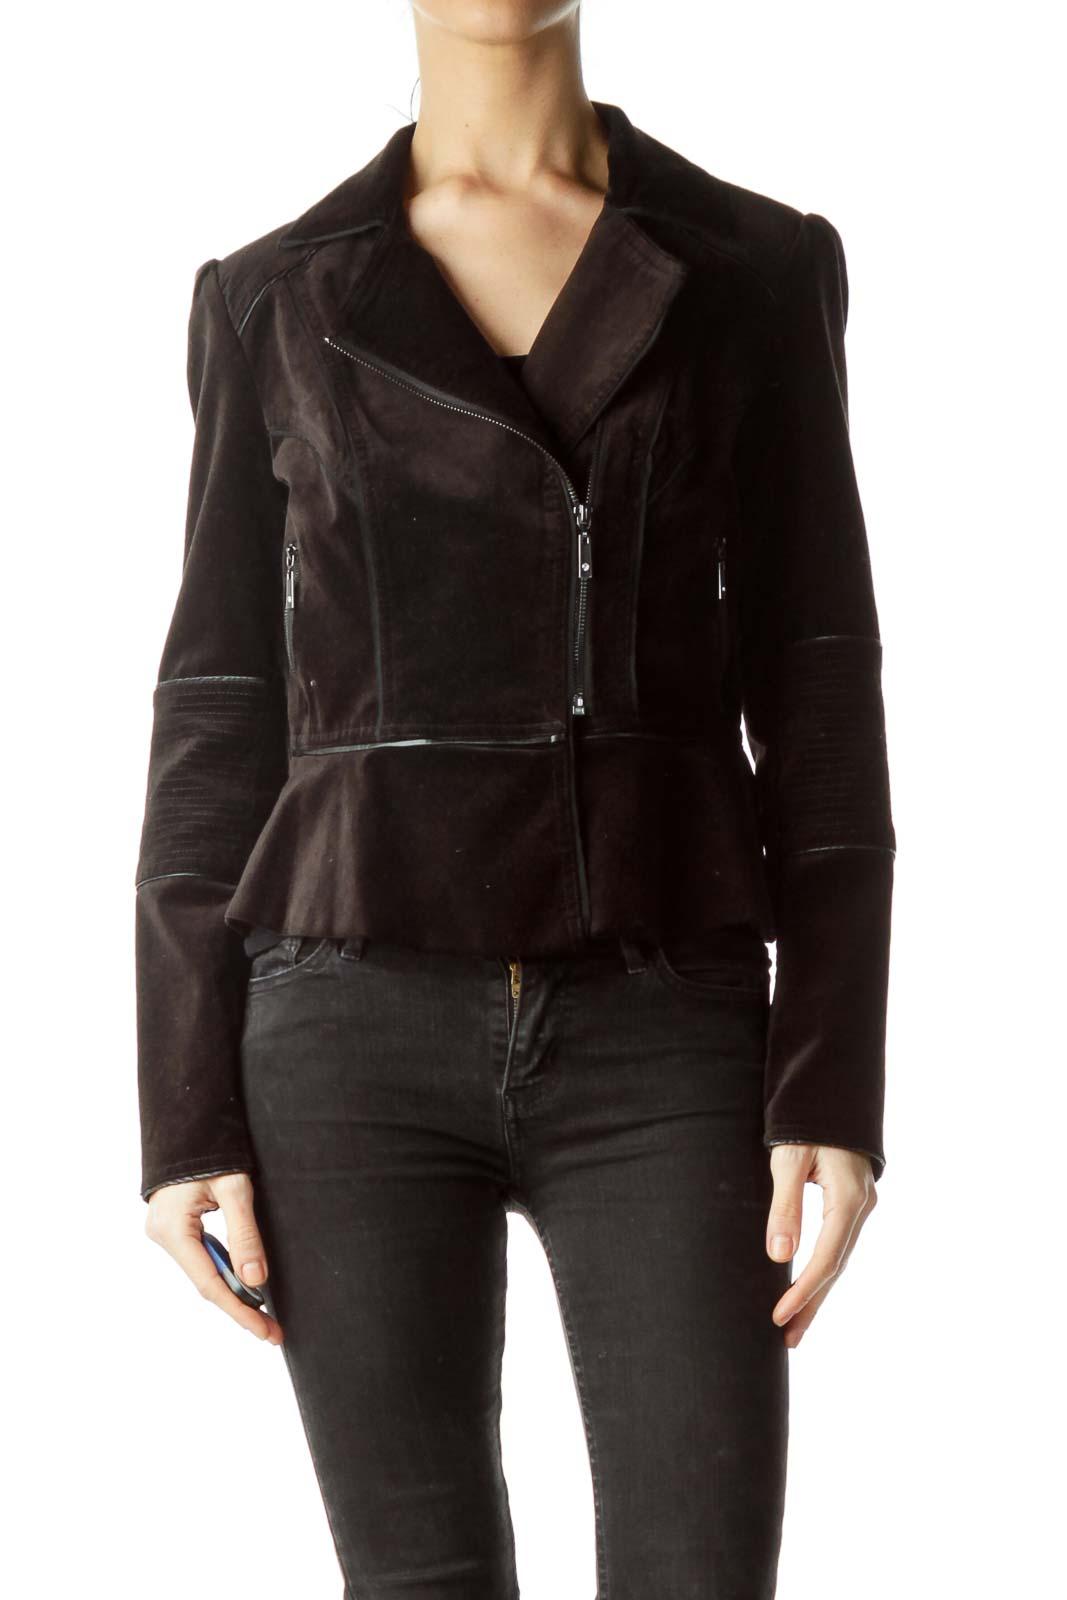 f9cf815f7 Shop Black Velvet Peplum Bomber Jacket clothing and handbags at ...